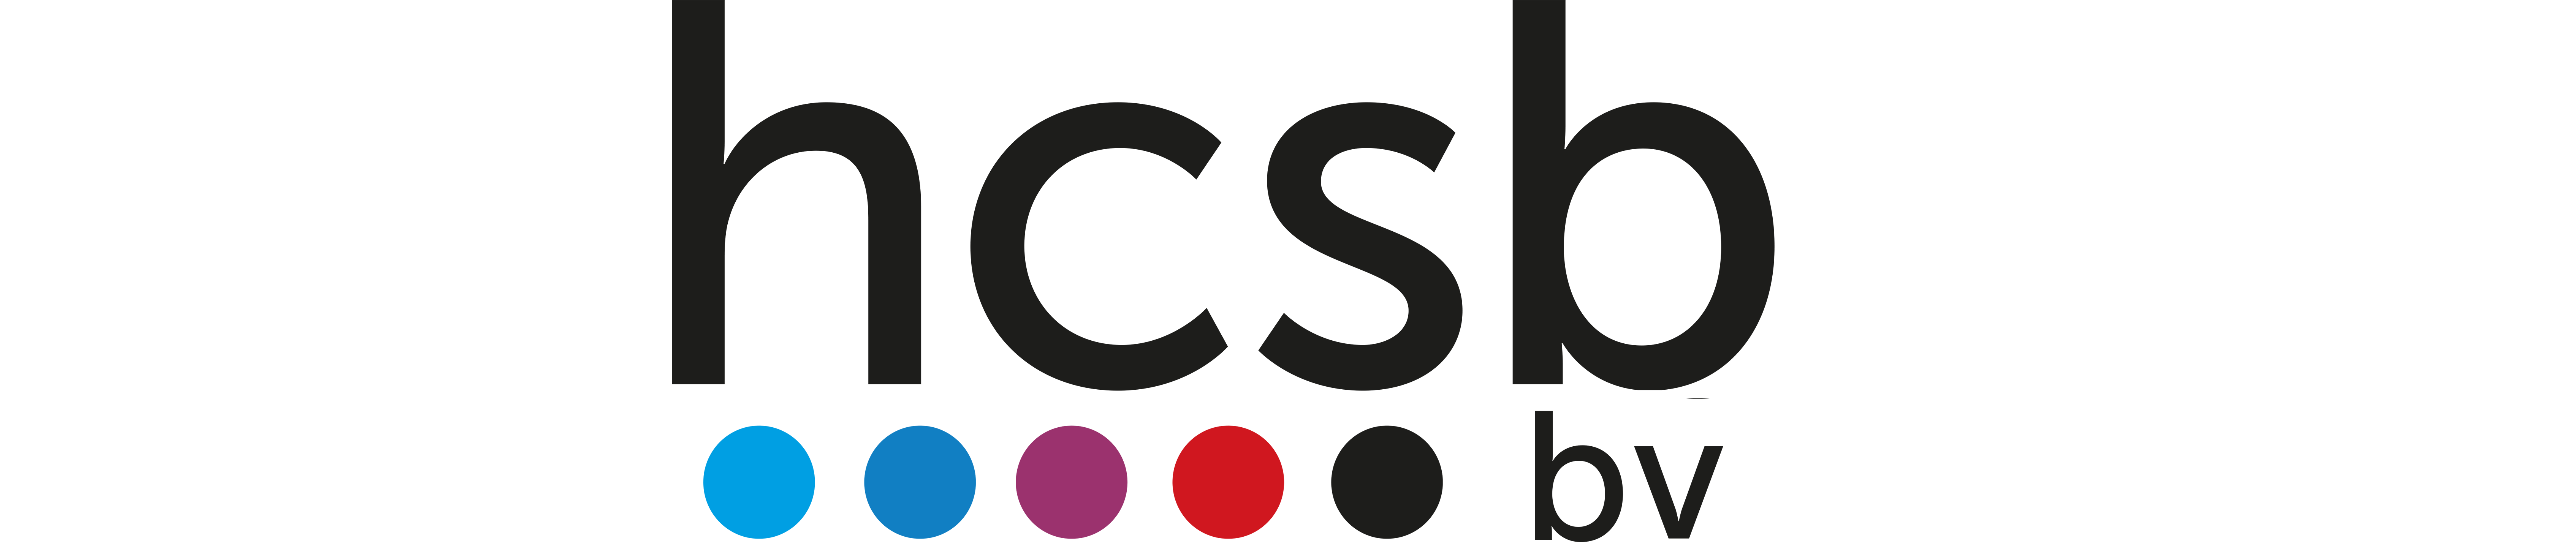 HCSB bvba - High quality billiard products